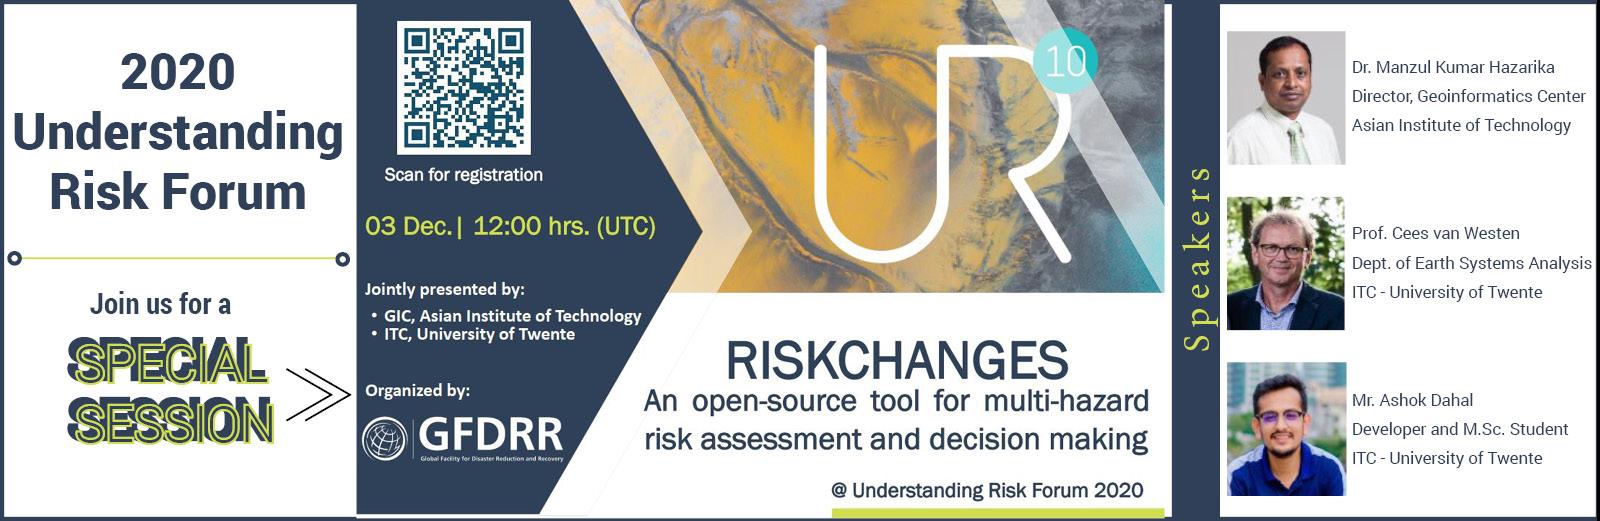 RiskChanges platform at the 2020 Understanding Risk Forum